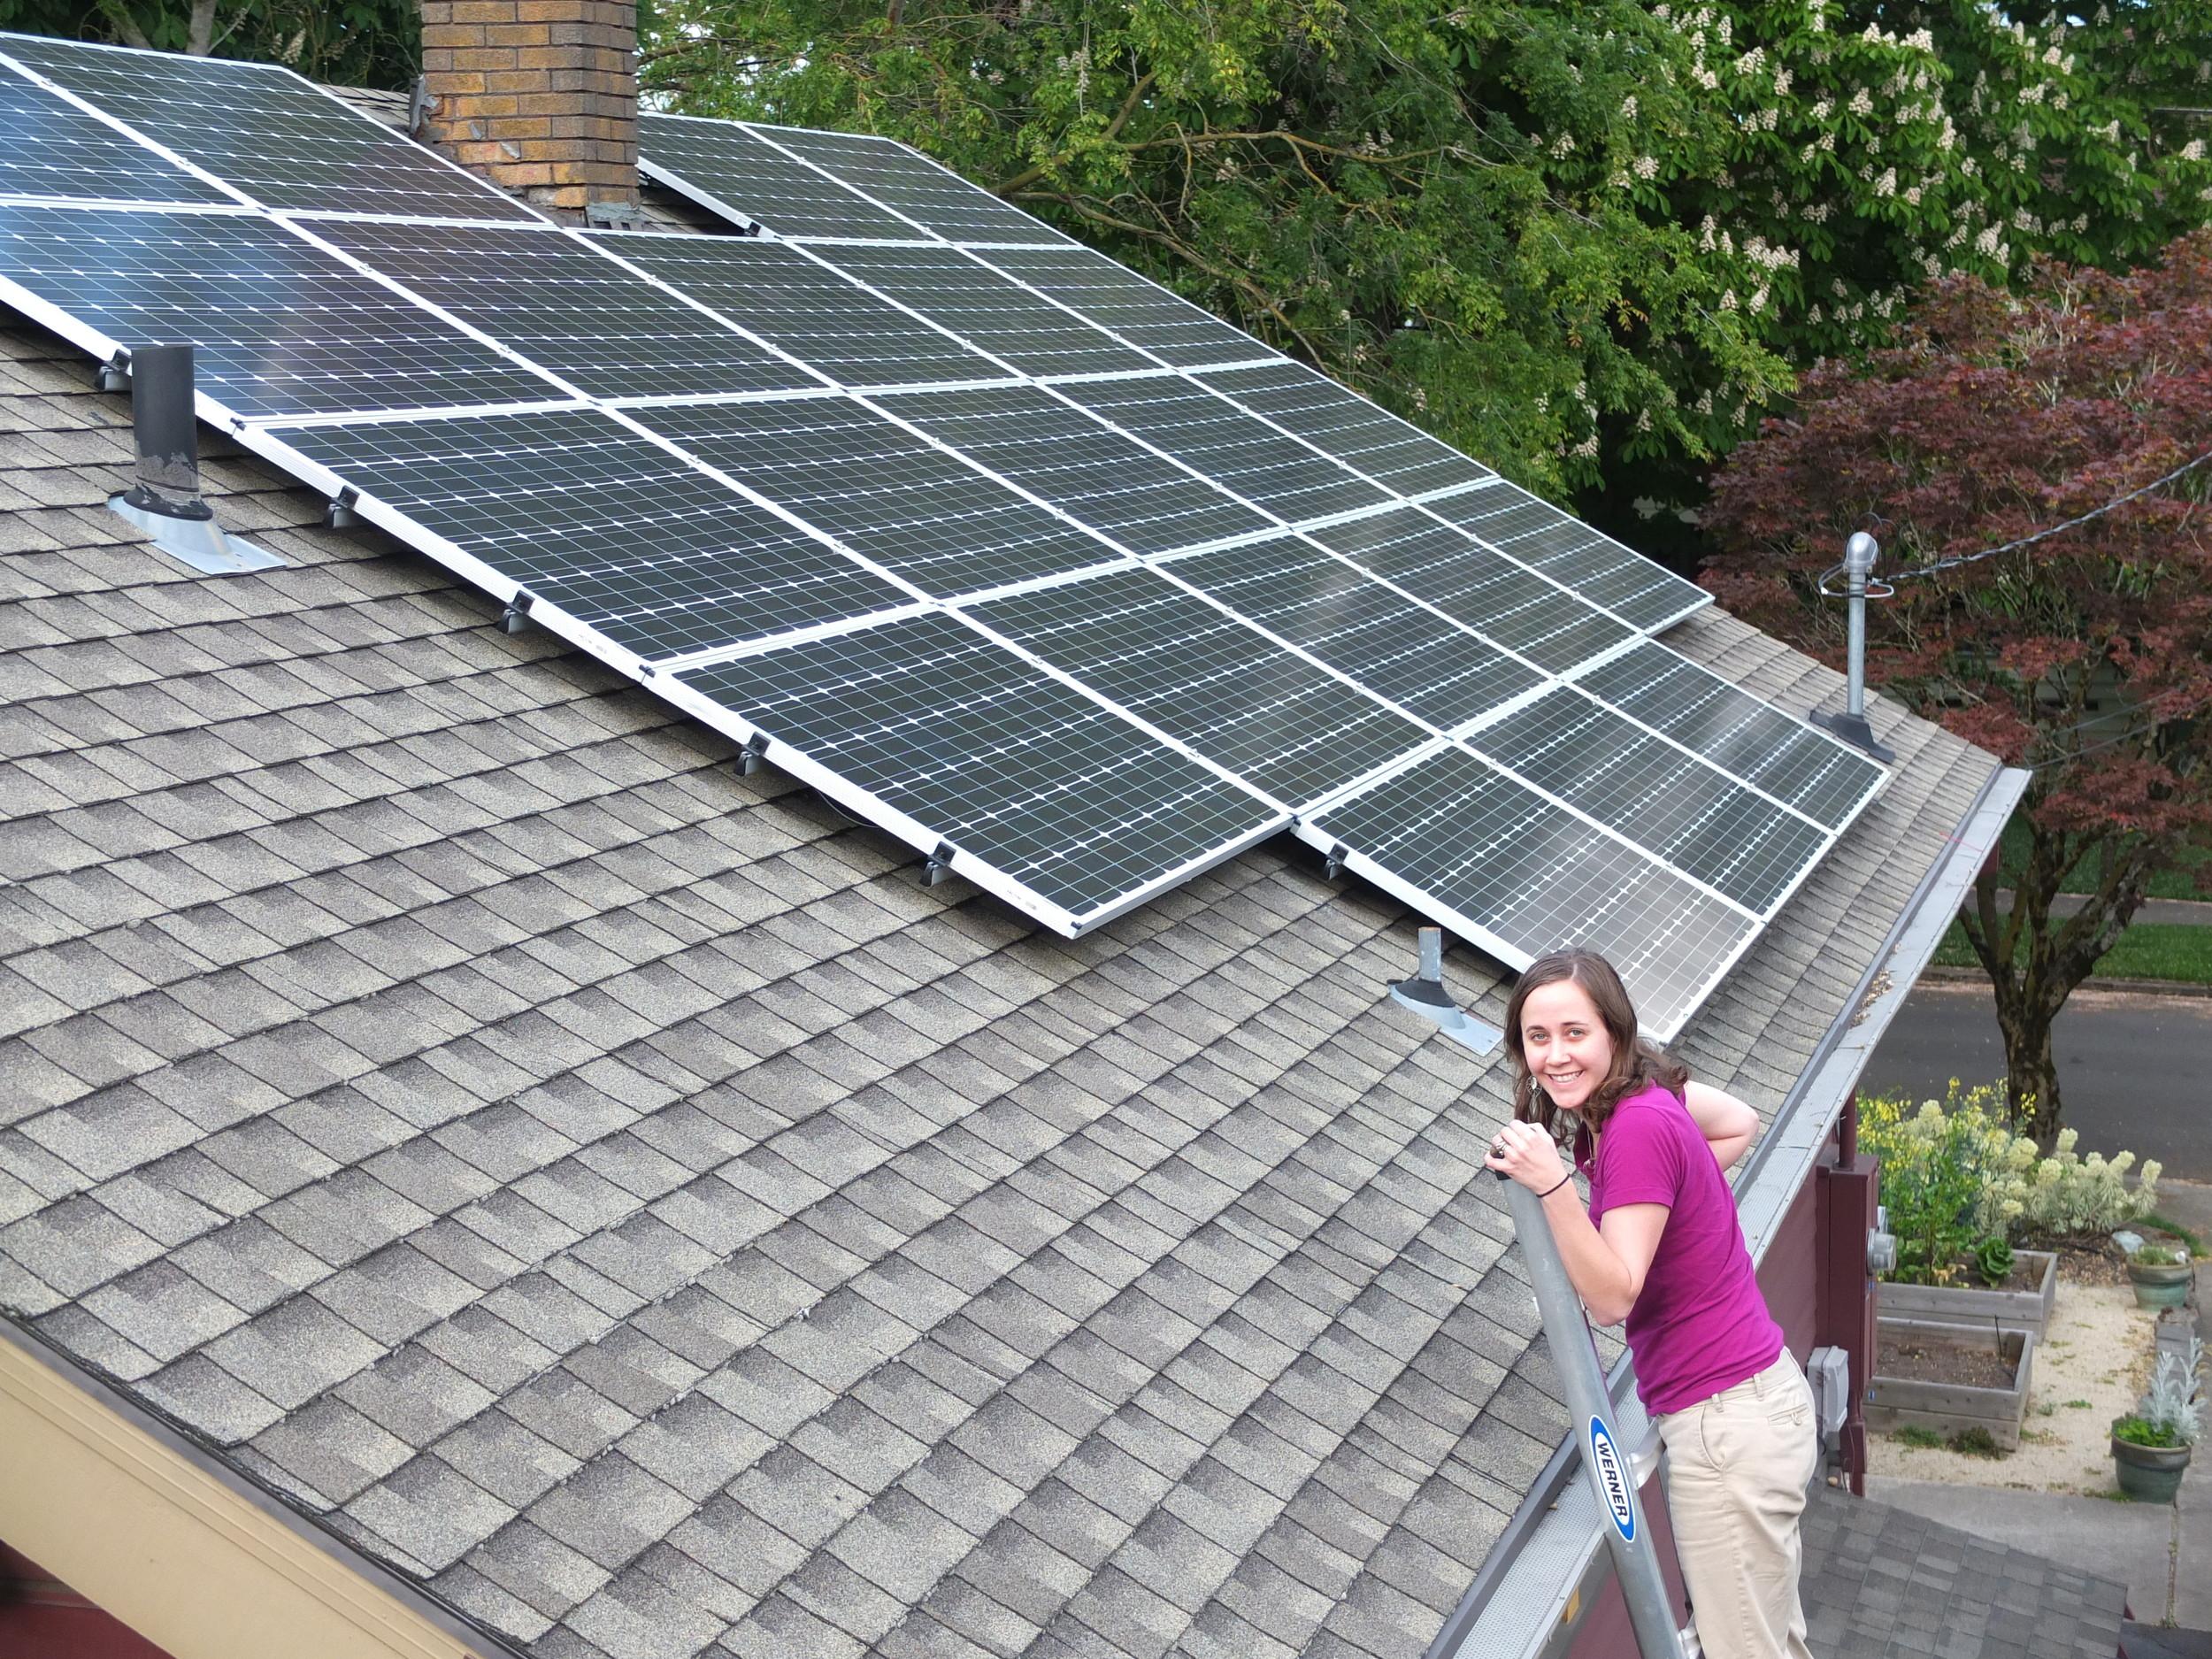 The solar panel installation powers the house and cedar hot tub.